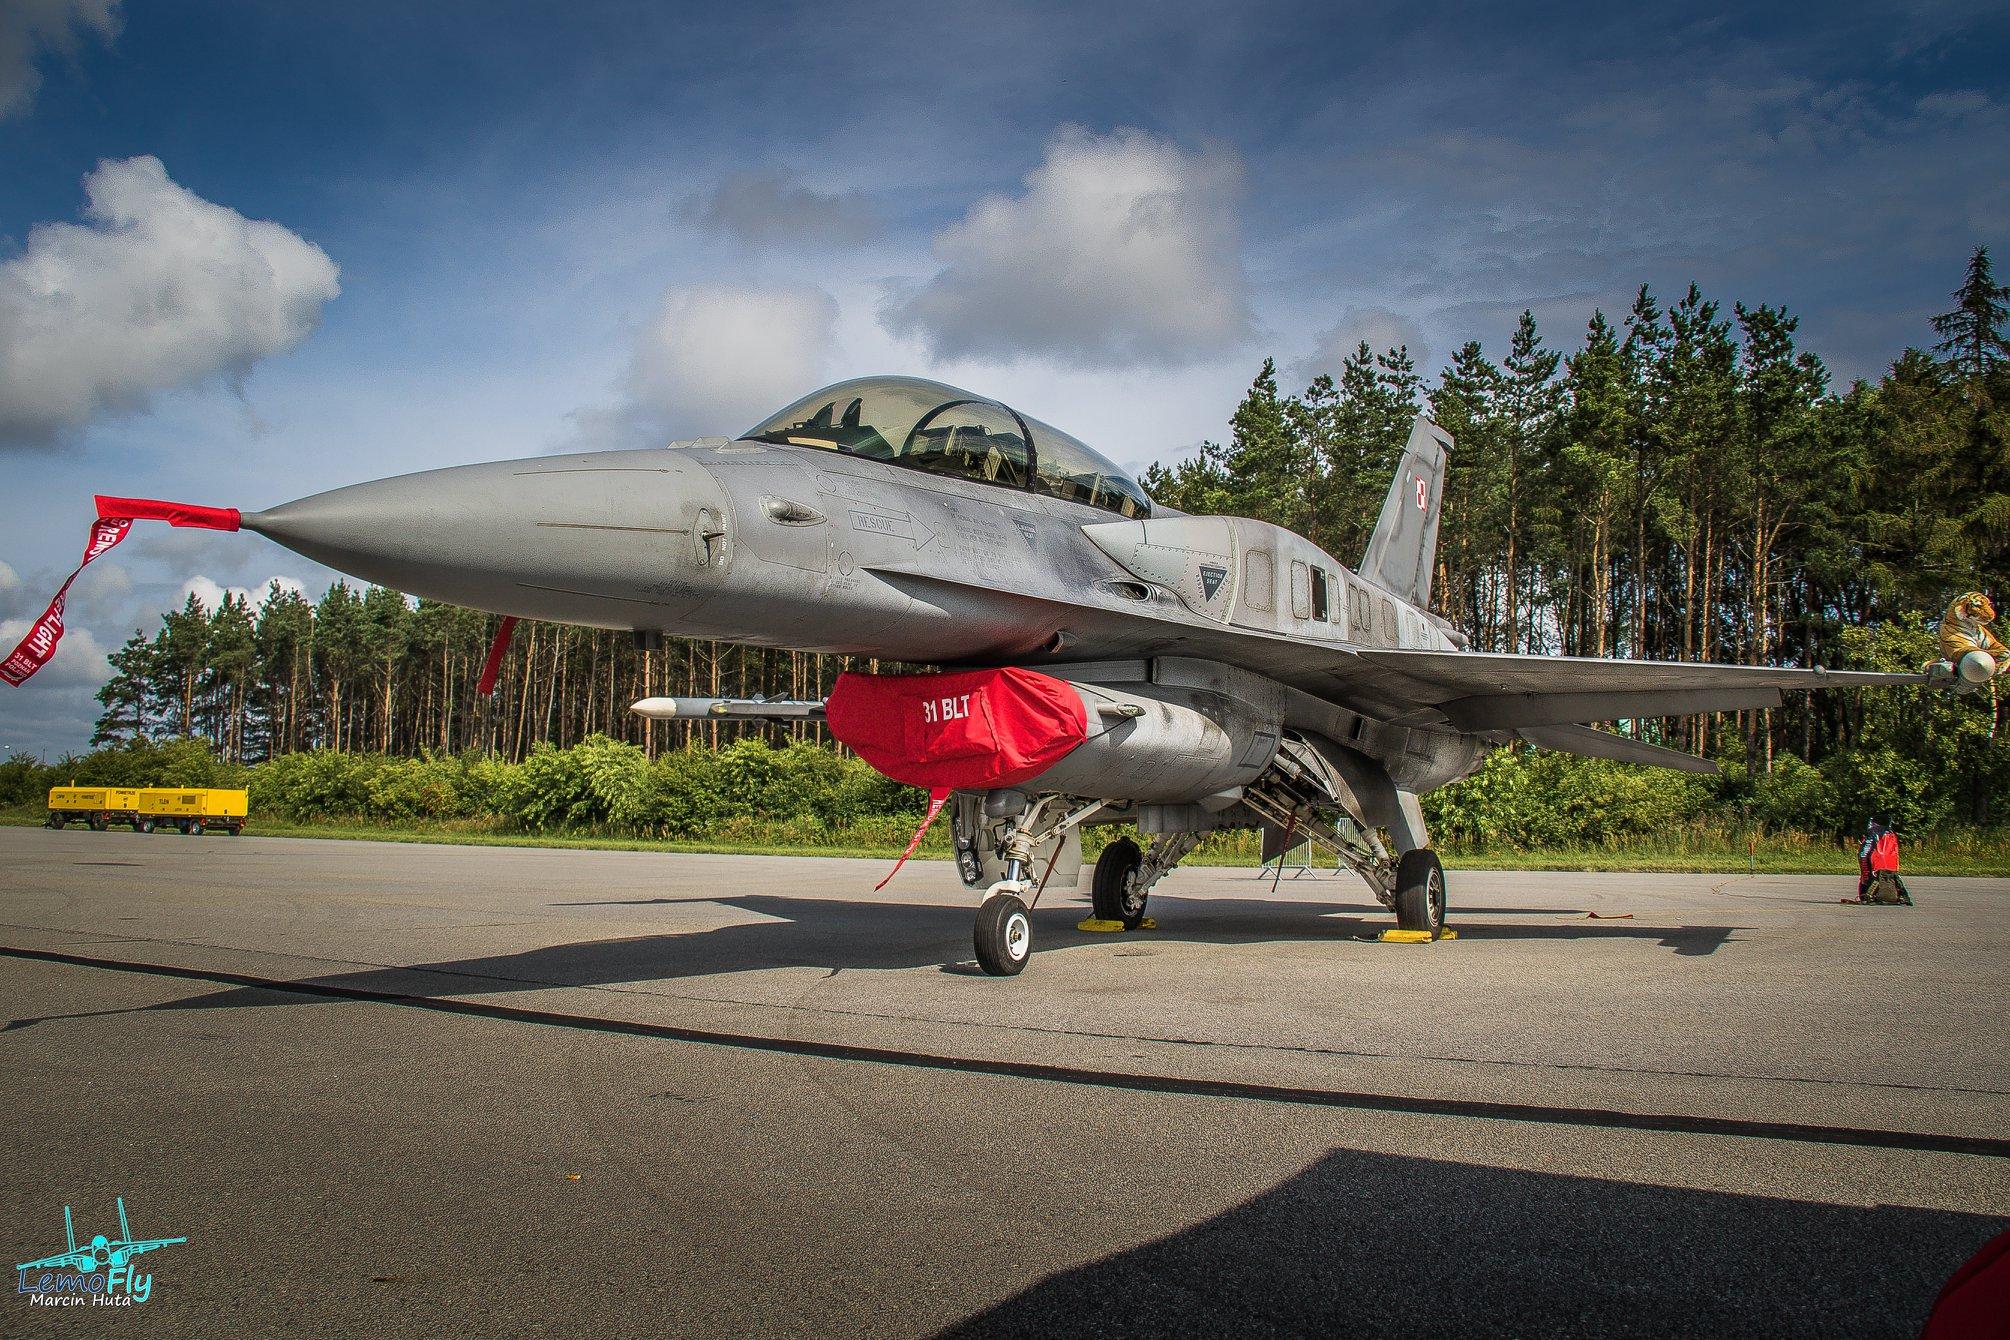 F 16 LemoFly Marcin Huta 1